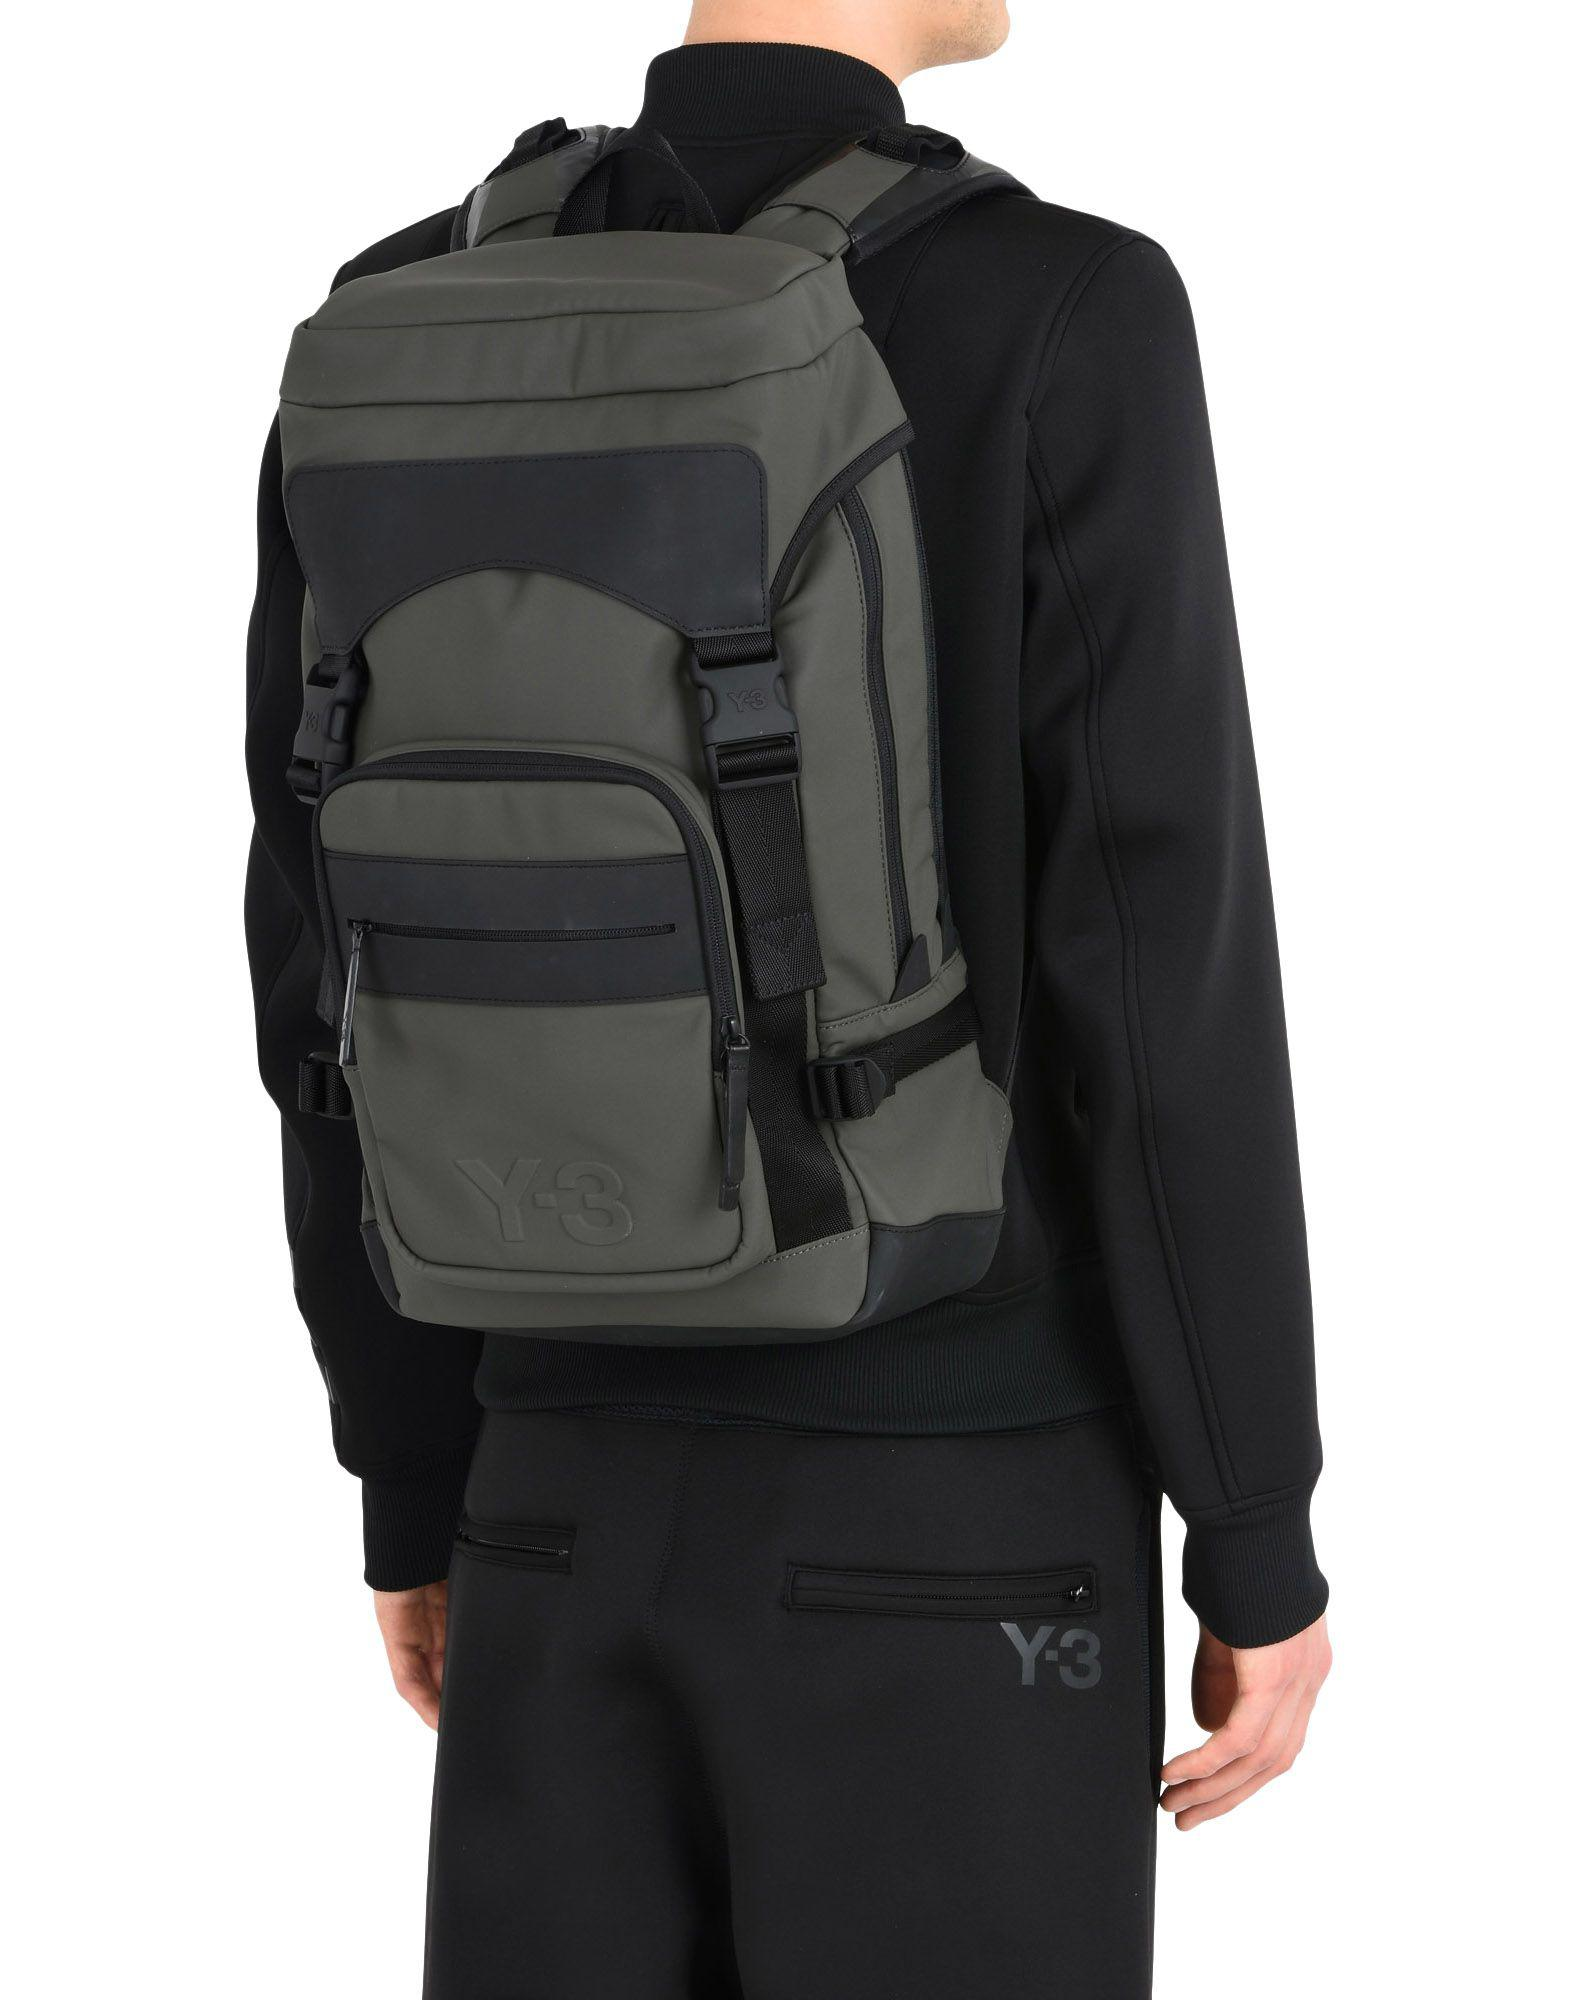 134a23819e Lyst - Y-3 Ultratech Bag in Green for Men